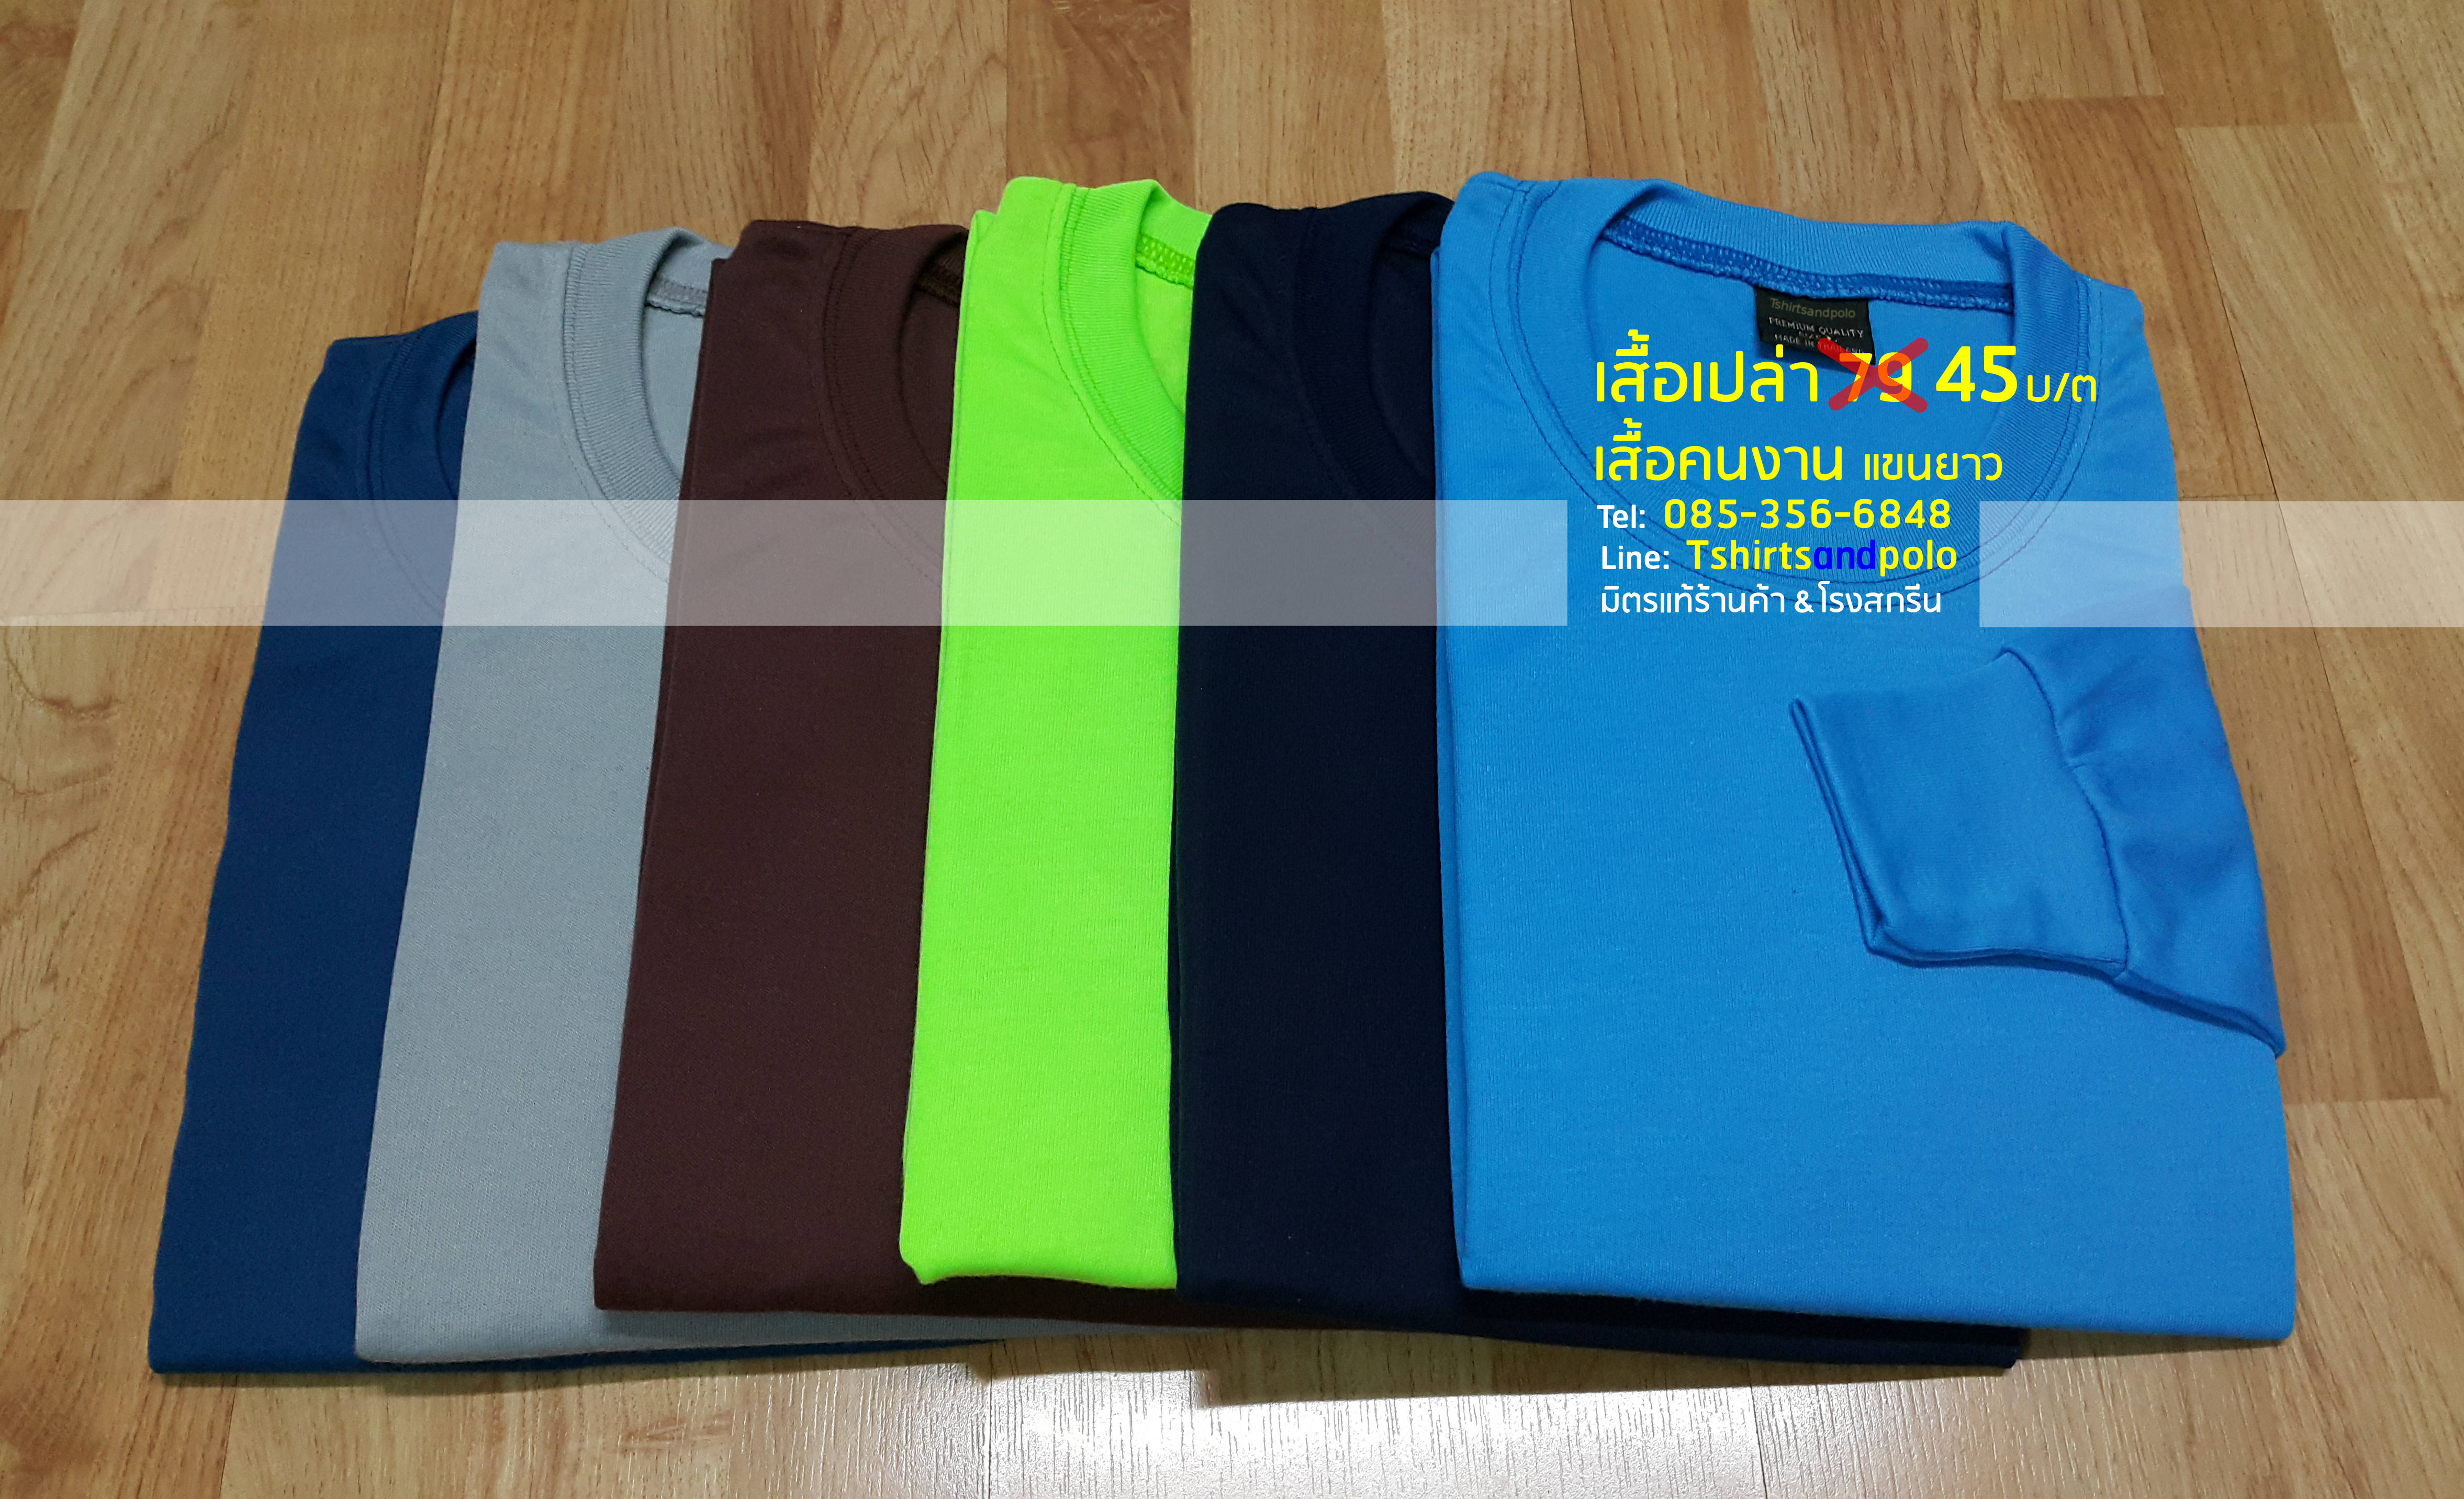 ALT เสื้อคนงานแขนยาวราคาส่ง  long  sleeves t-shirts เสื้อคนงานไม่แพง เสื้อเปล่า ราคาส่ง_เสื้อคนงานก่อสร้าง ใช้ดี ราคาดี สีสวยๆ ต้องทีเชิ๊ตแอนด์โปโล